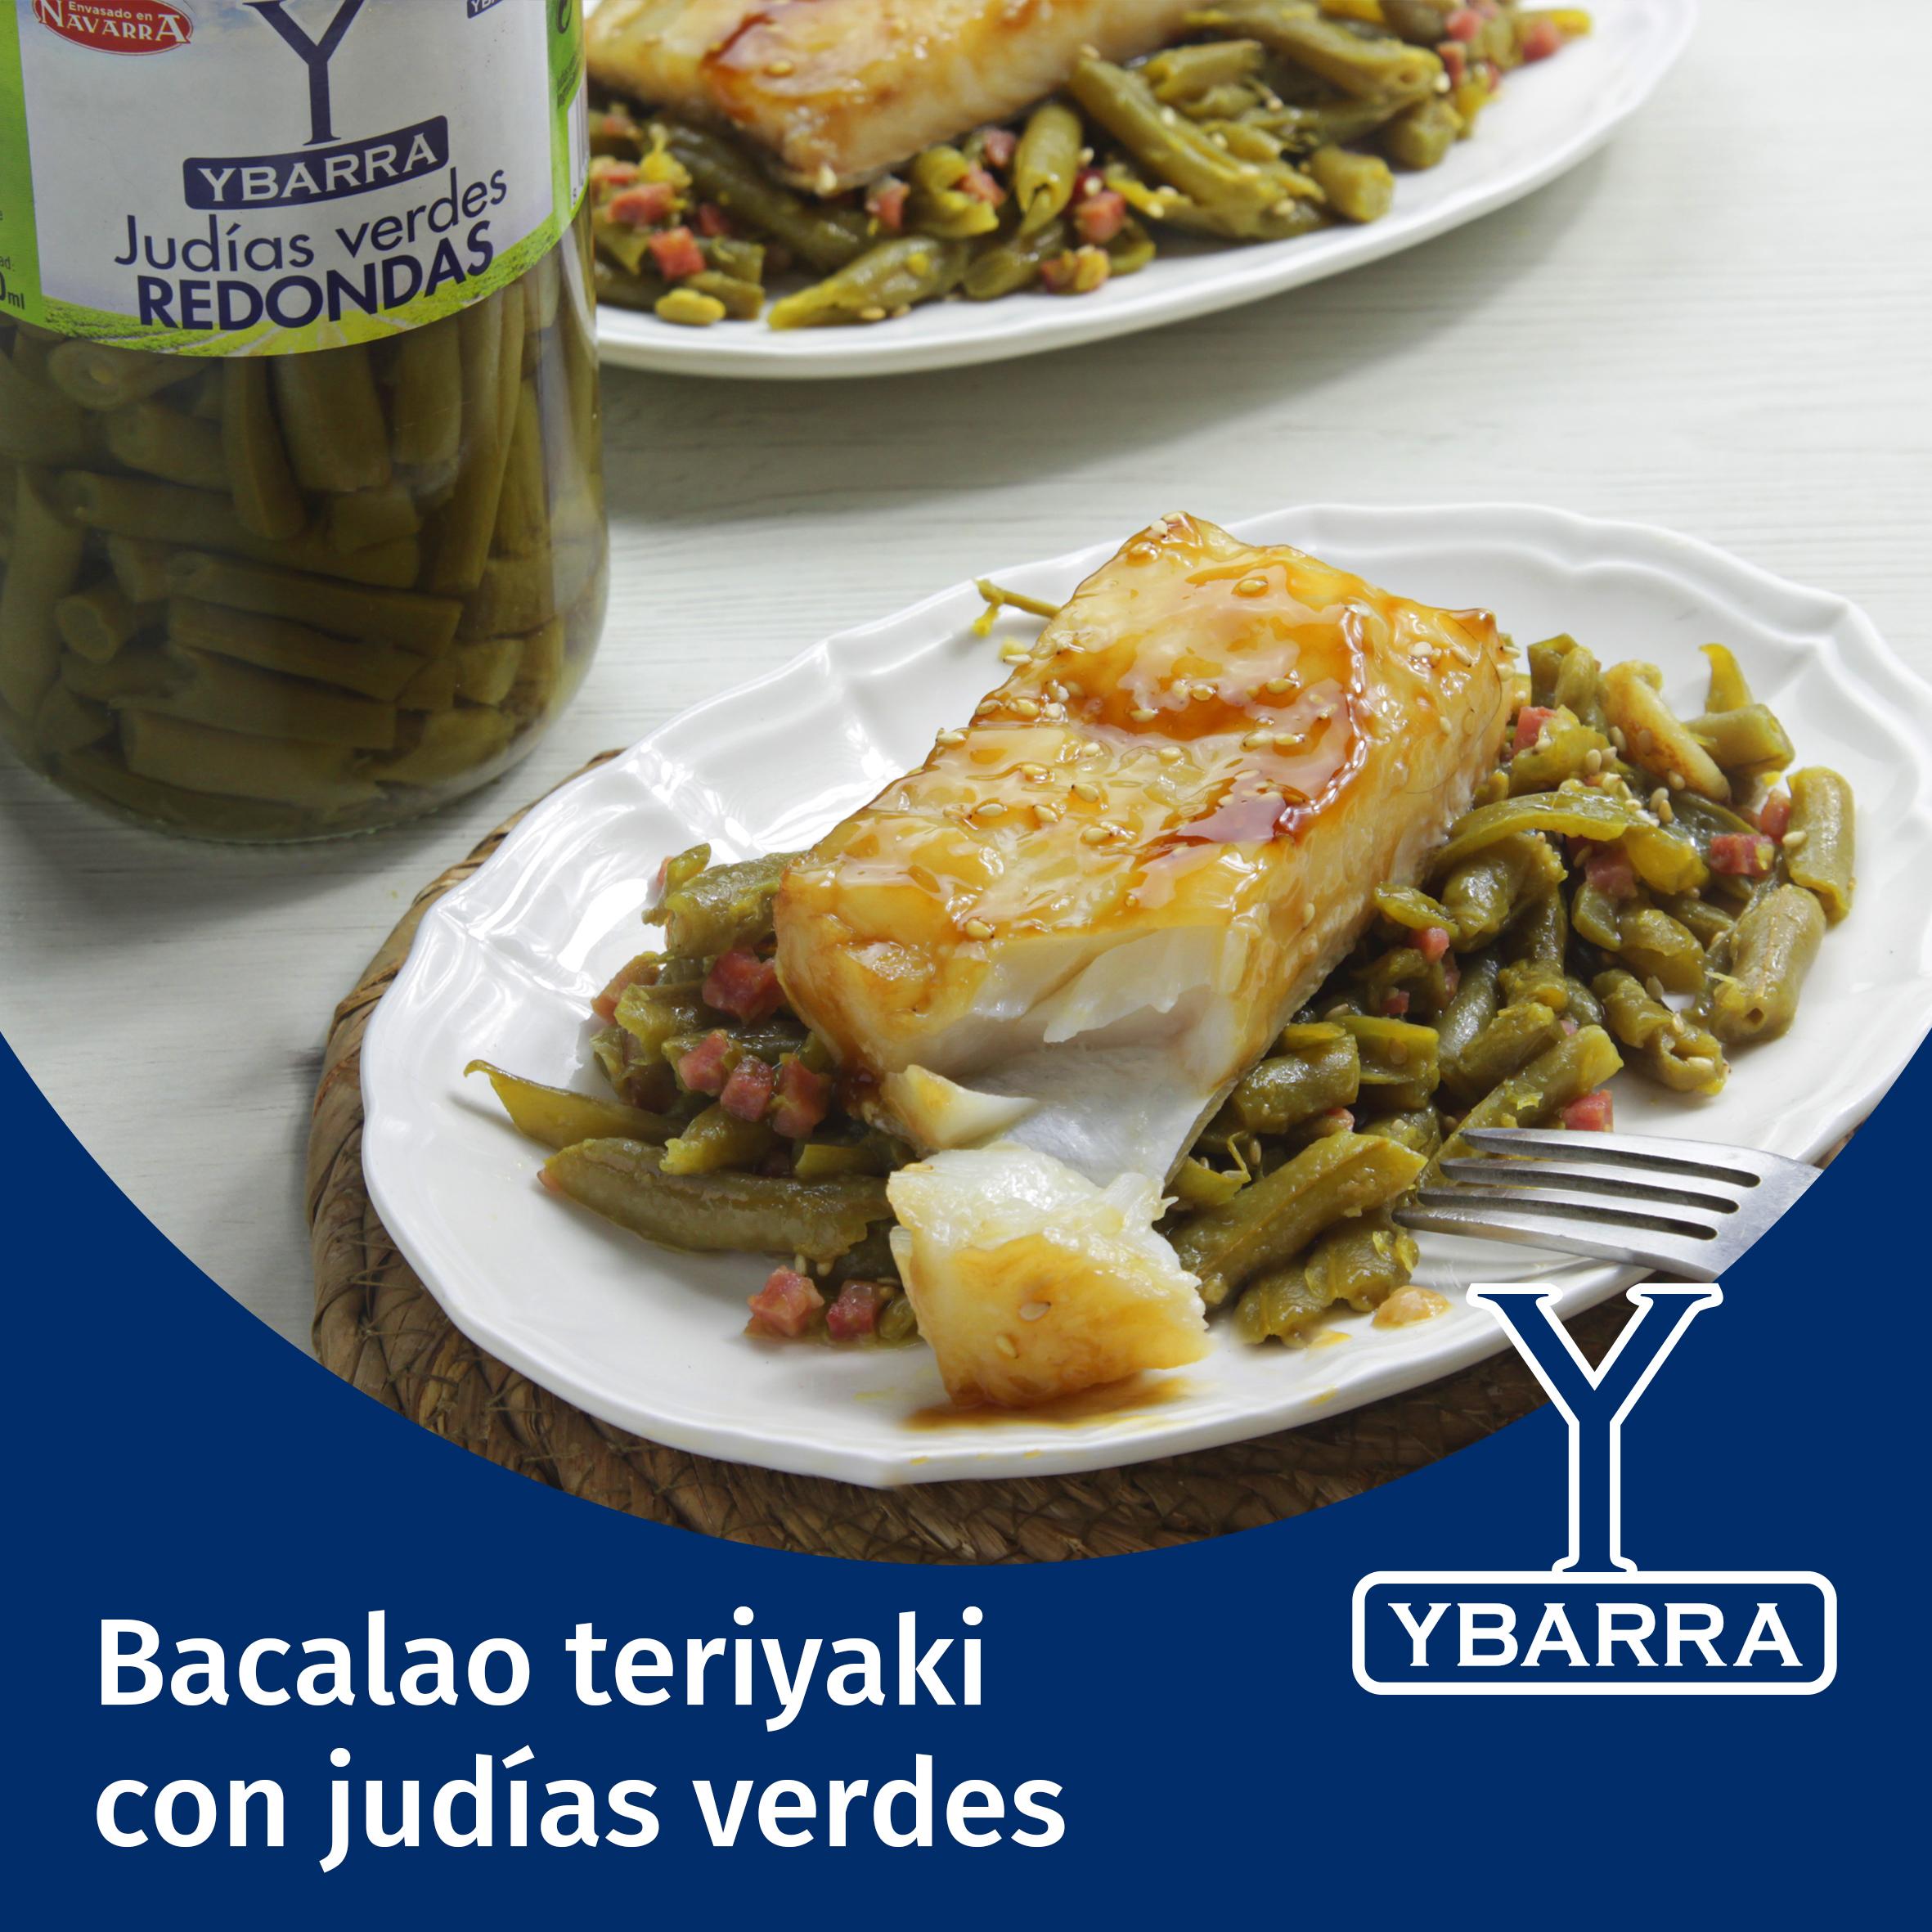 Receta bacalao al teriyaki con jud as verdes ybarra en tu cocina - Judias verdes ybarra ...